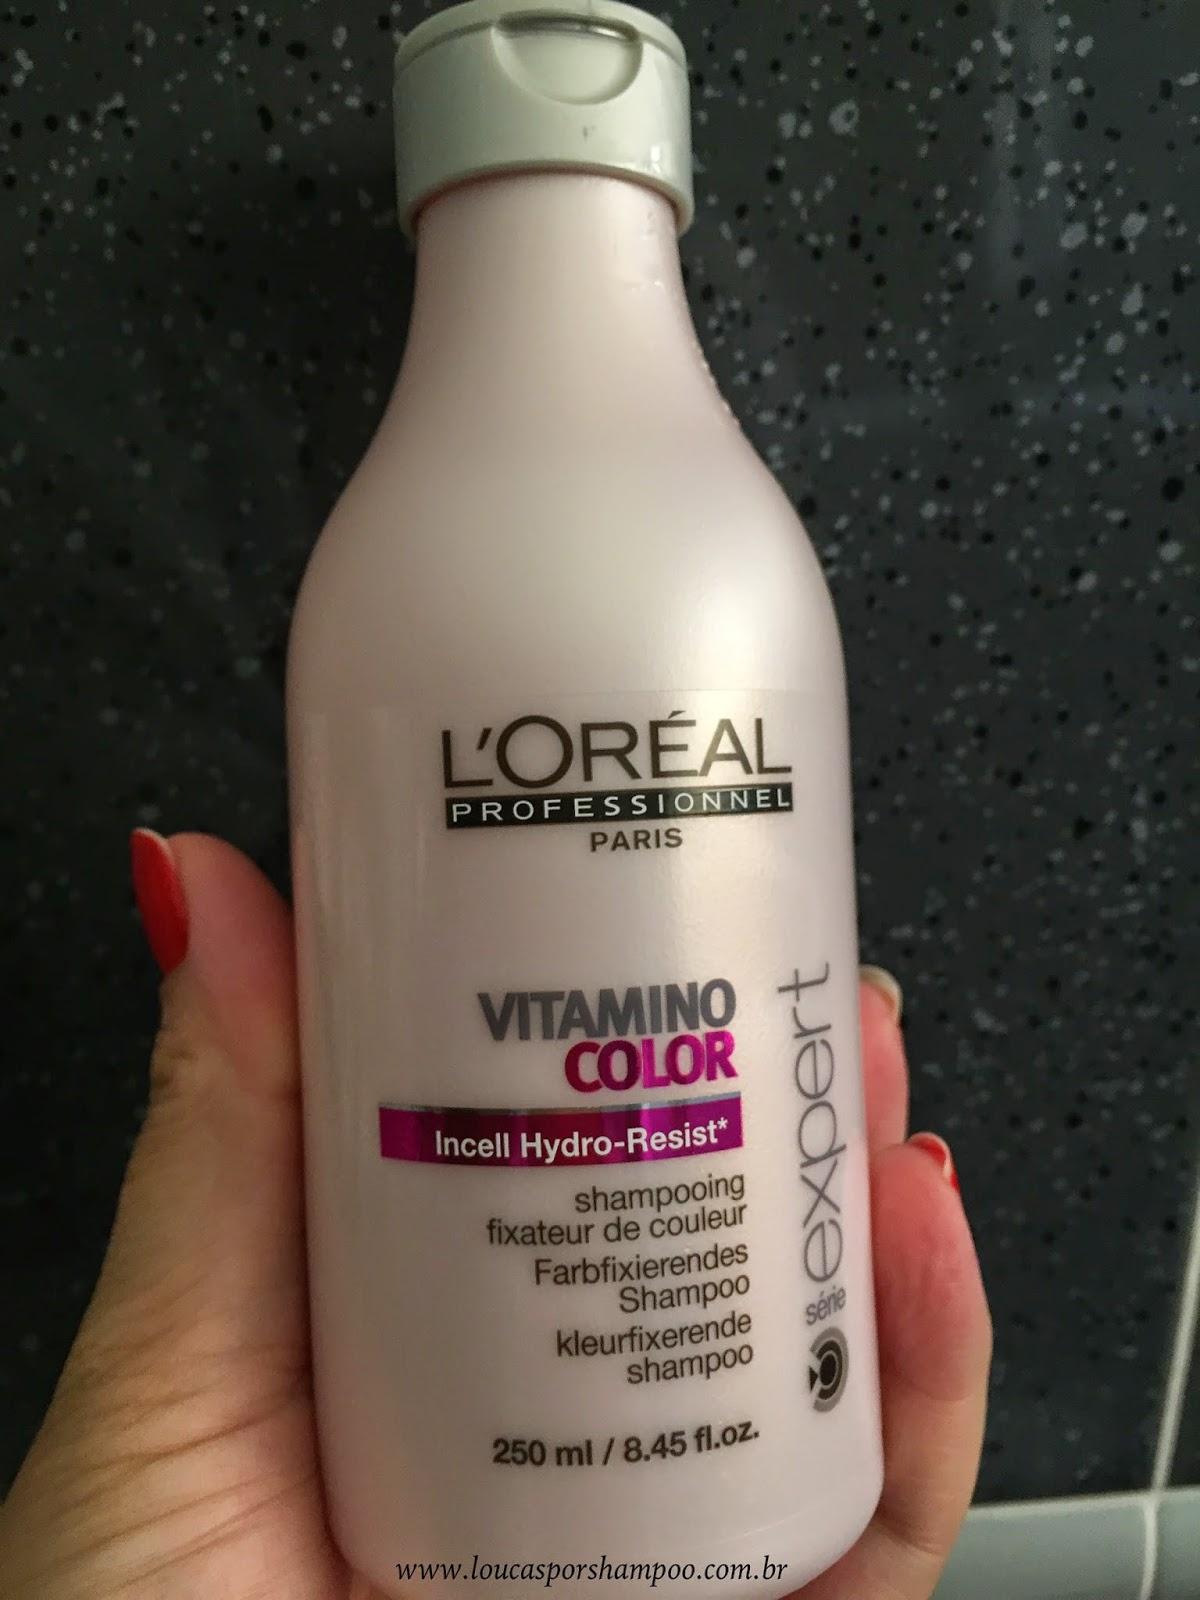 Loucasporshampoo Shampoo Vitamino Color Loreal Professionnel